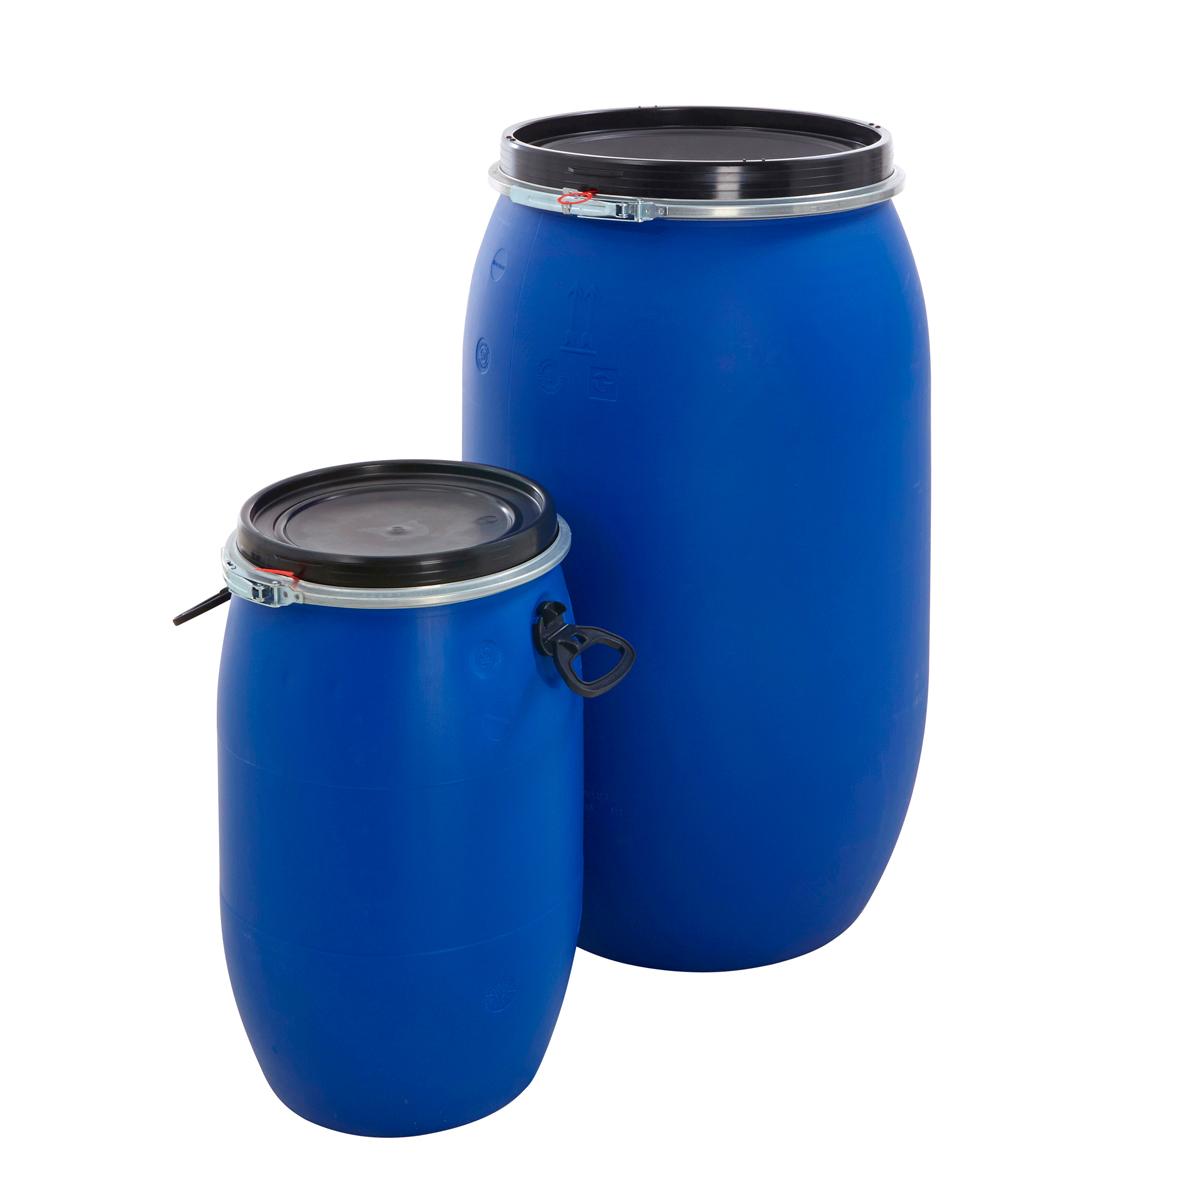 Barrel Storage Containers Listitdallas